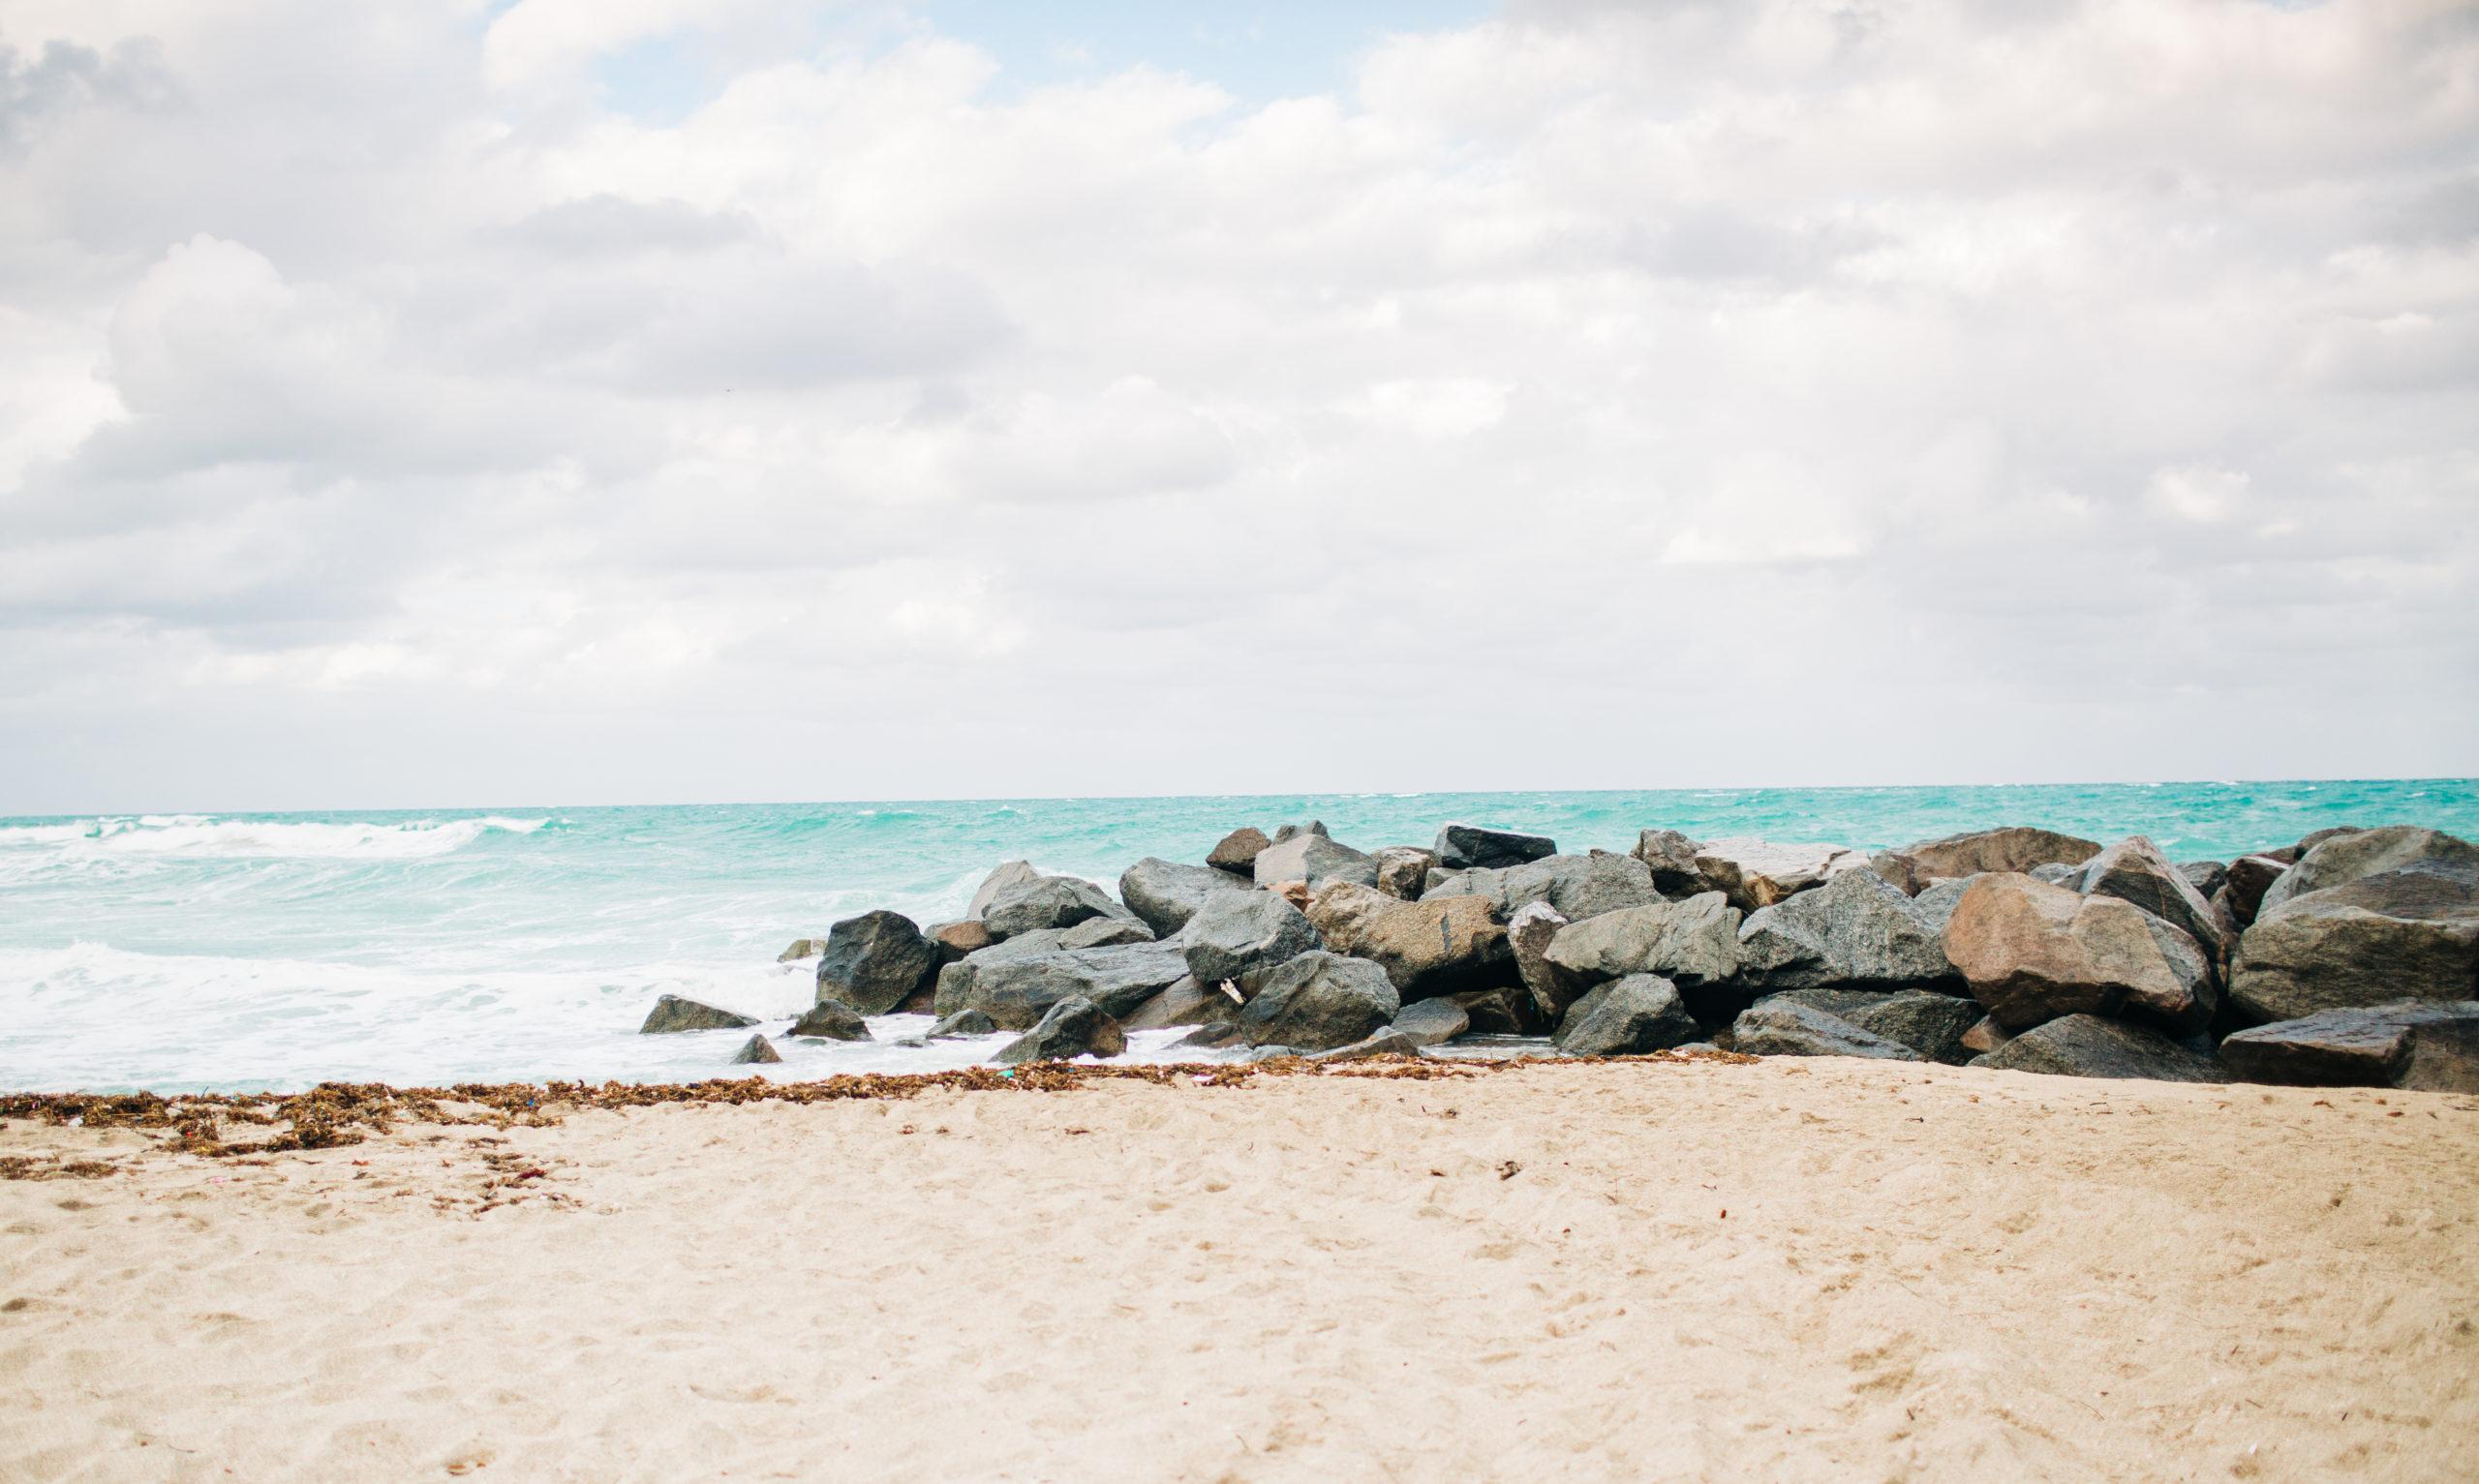 FamilySessionBeach_Alisa-2-scaled Miami's 8 best Photoshoot Locations